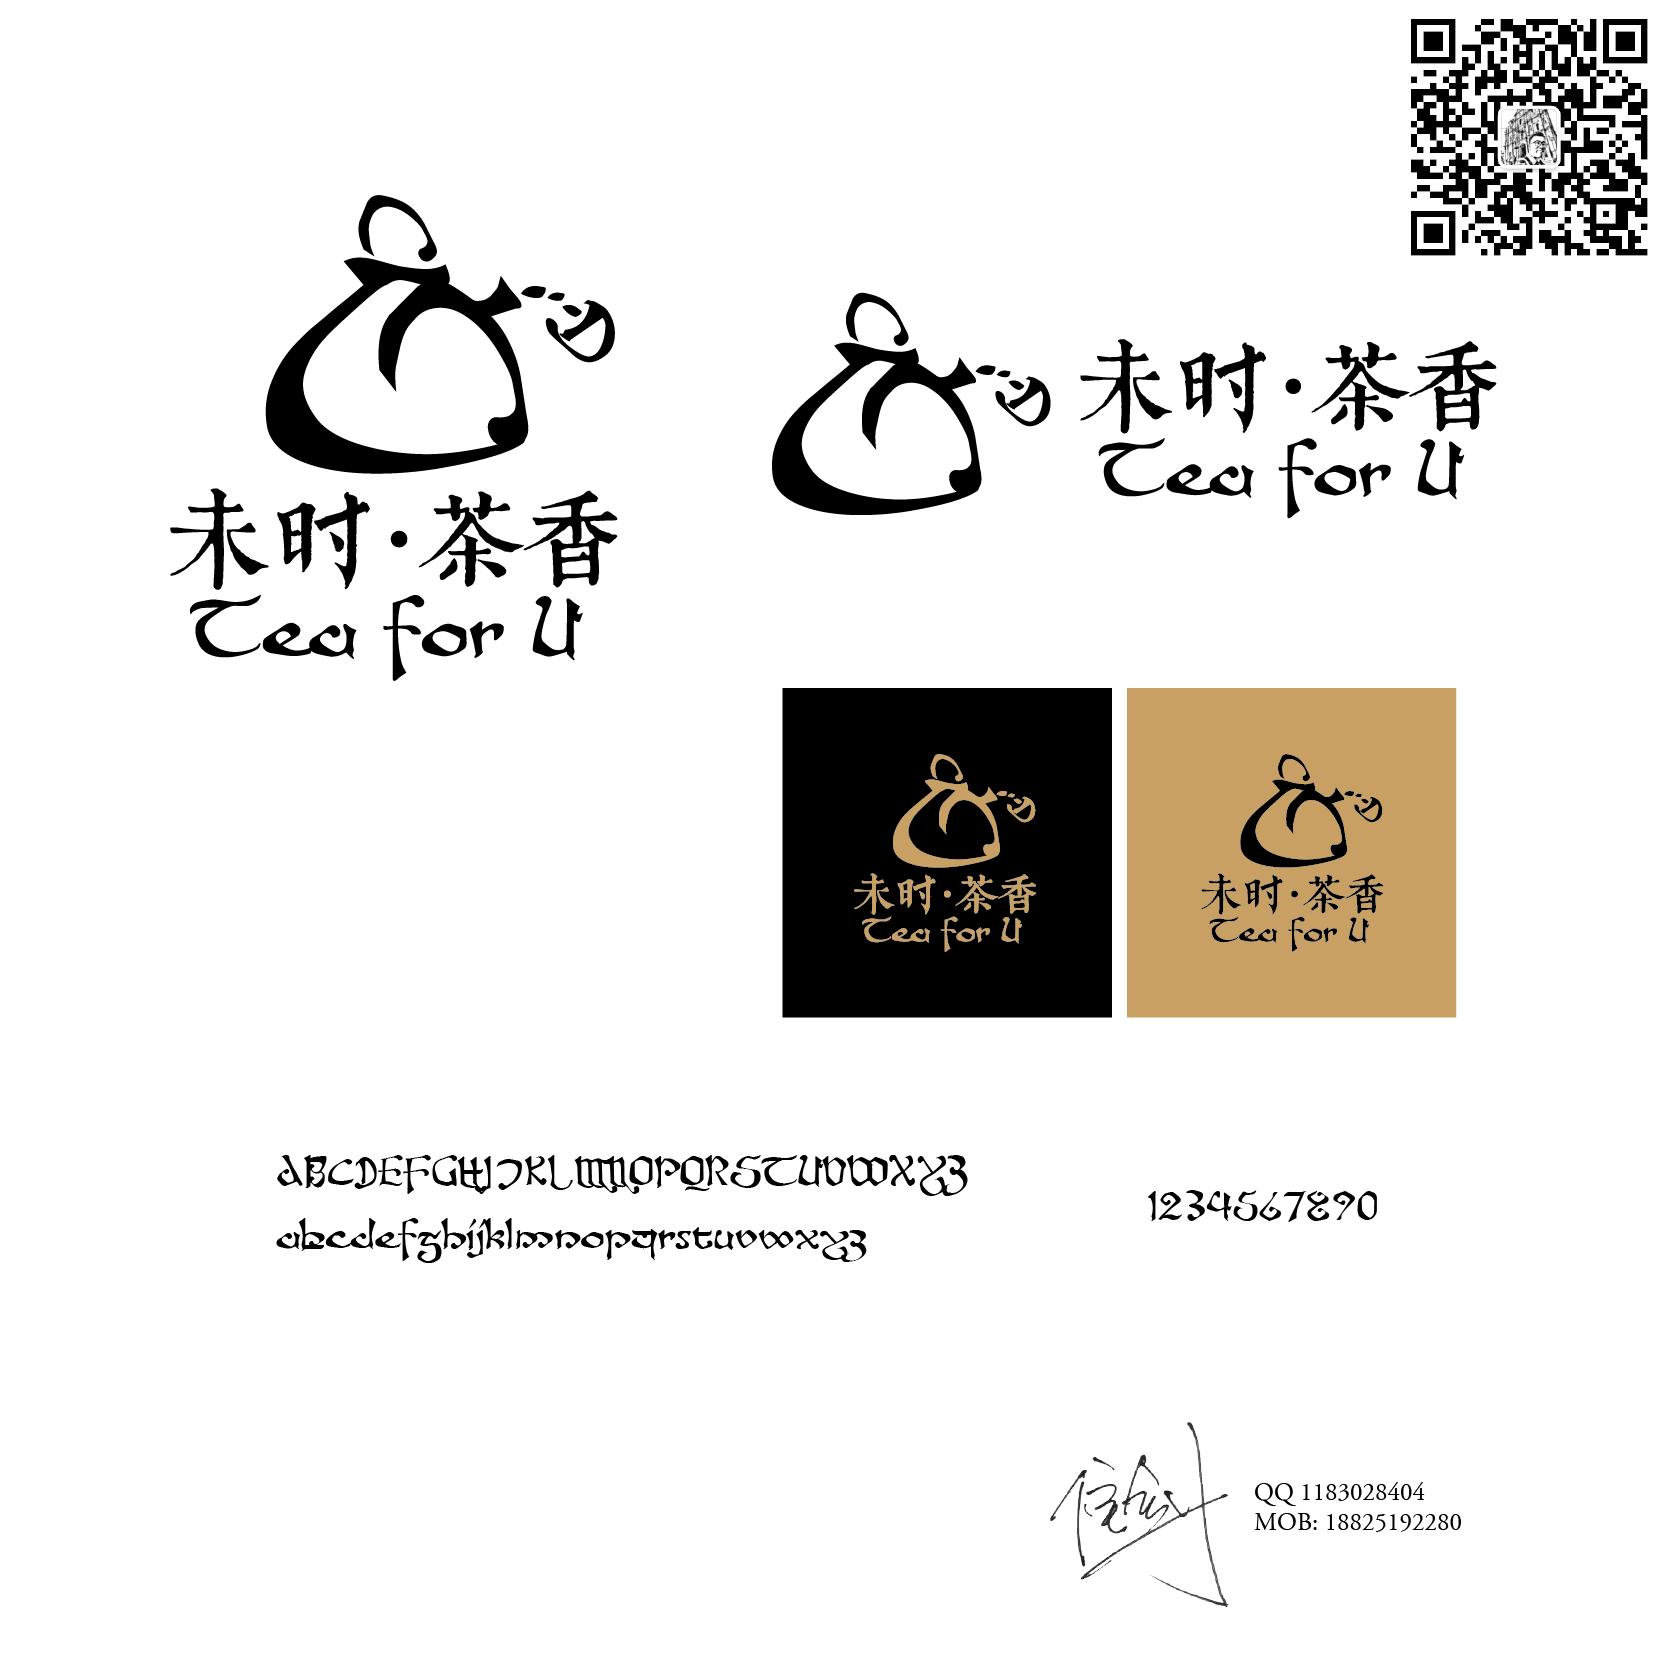 a chinese tea house logo,RMB7,800, USD 1,500 if u feel